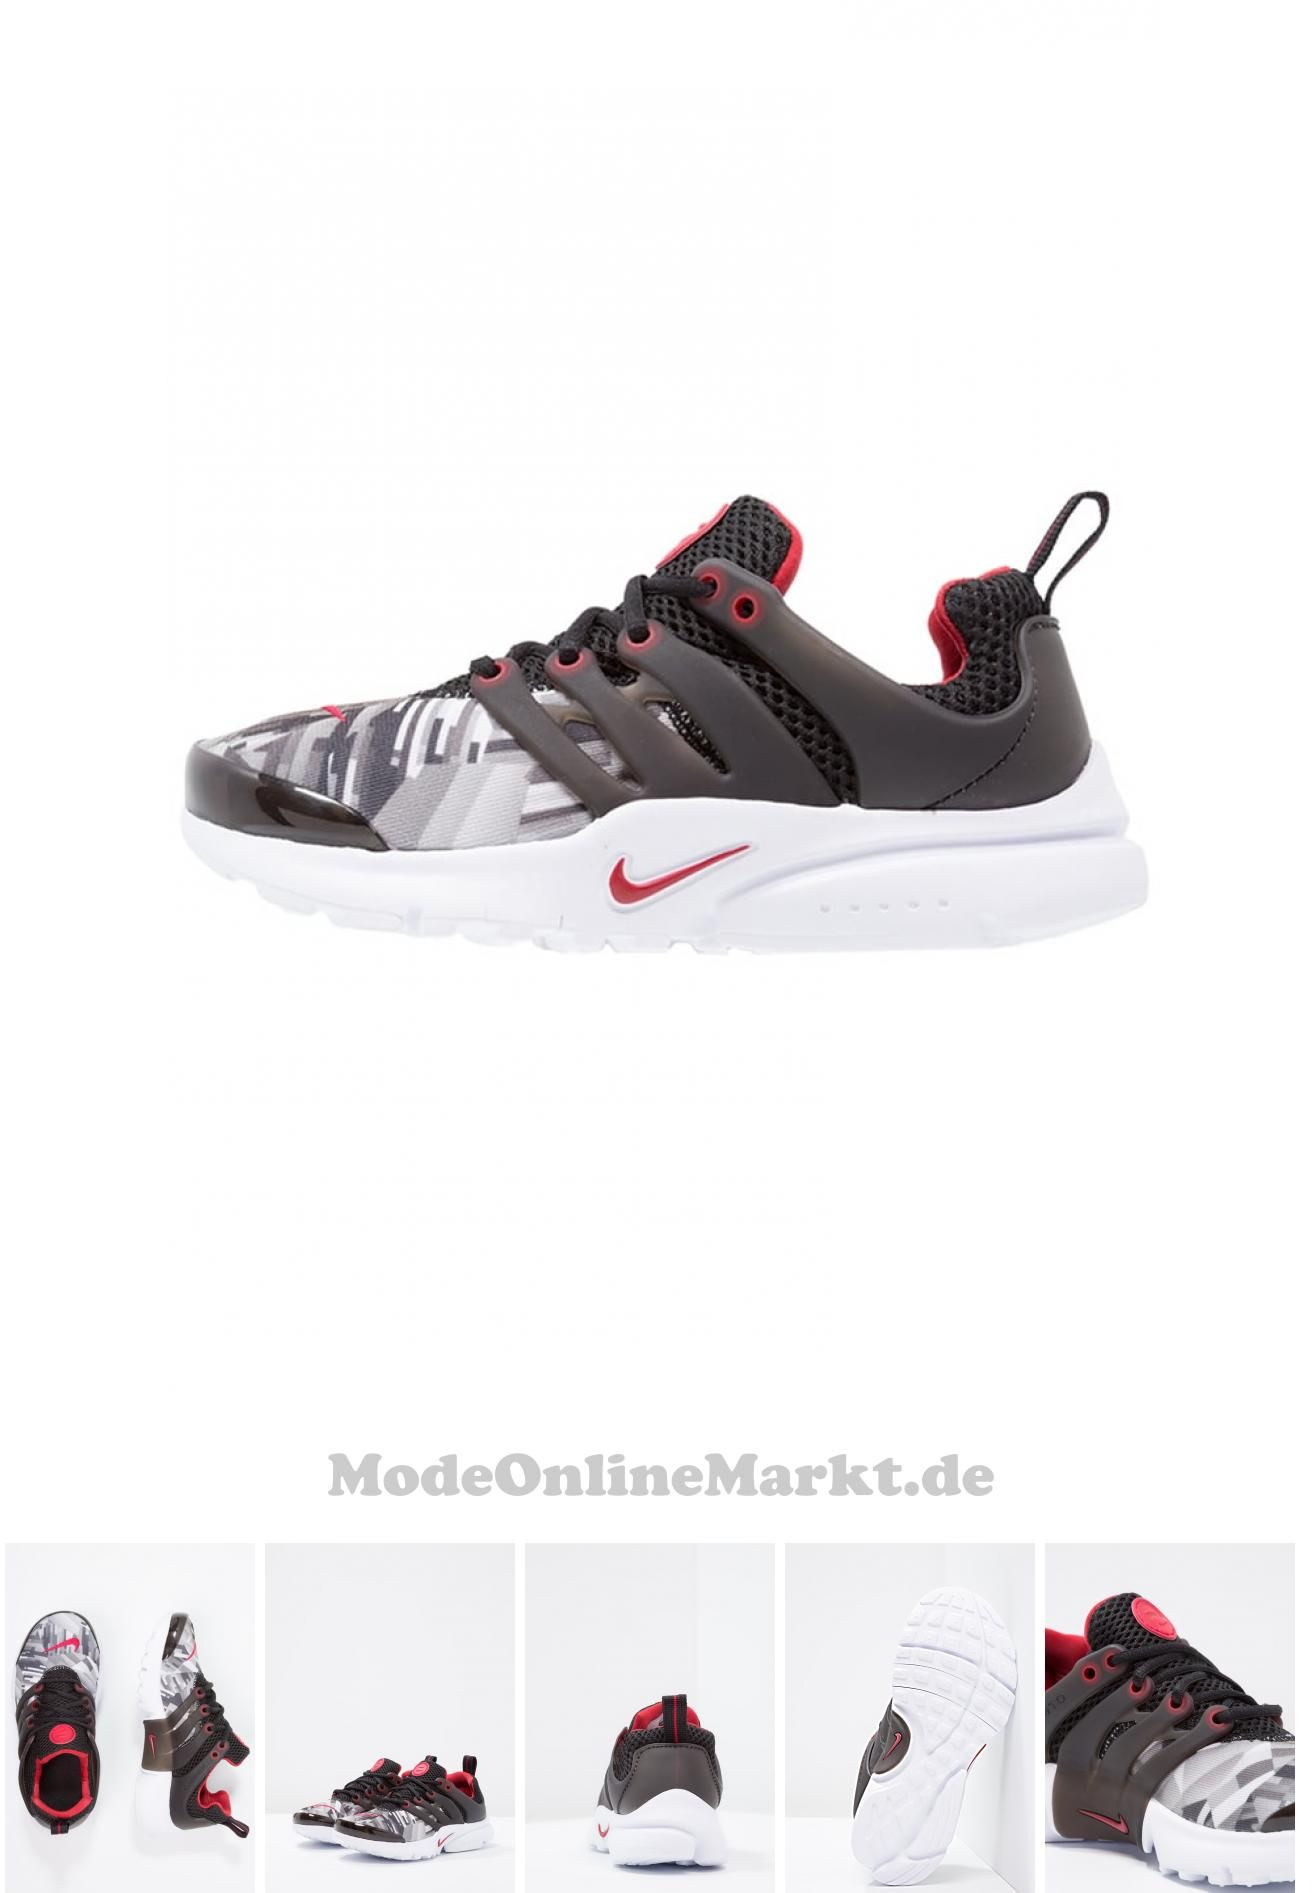 new style 7ac4a 24d62 Wolf · Gym · Pojkar · 00823233427846    Nike  Sportswear  PRESTO  Sneaker   low  black gym